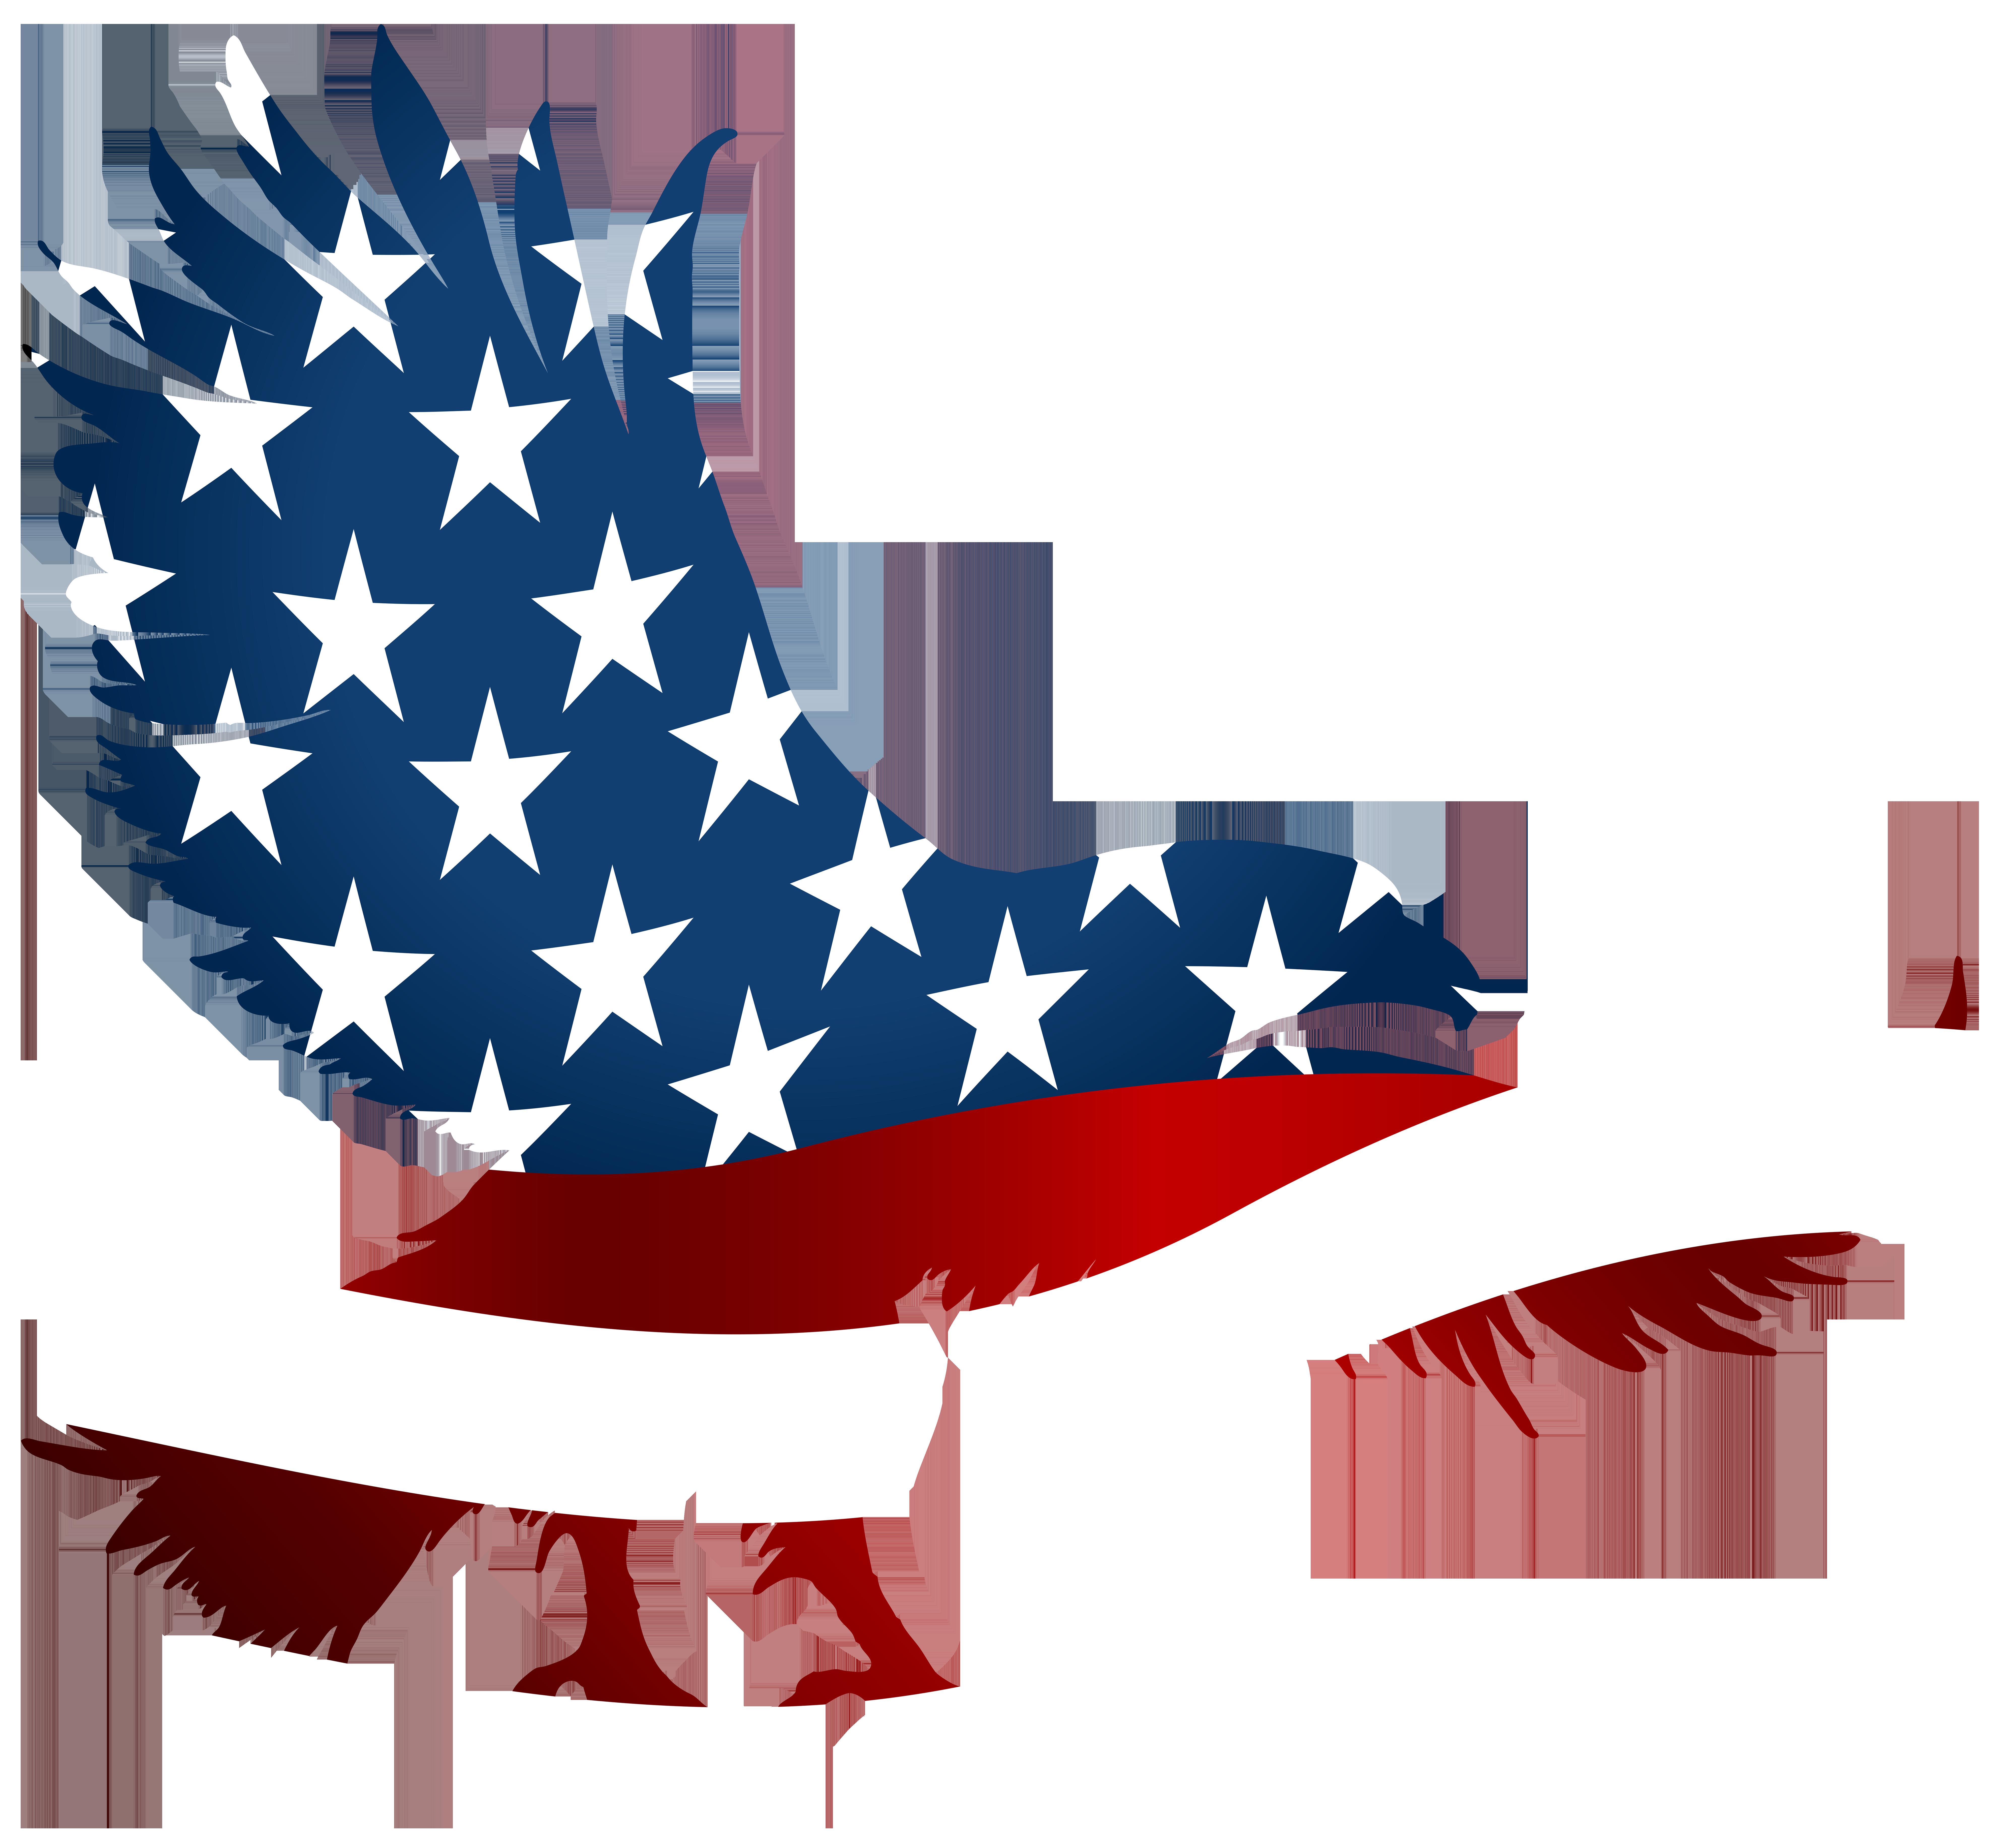 8000x7332 American Eagle Flag Transparent Png Clip Art Imageu200b Gallery